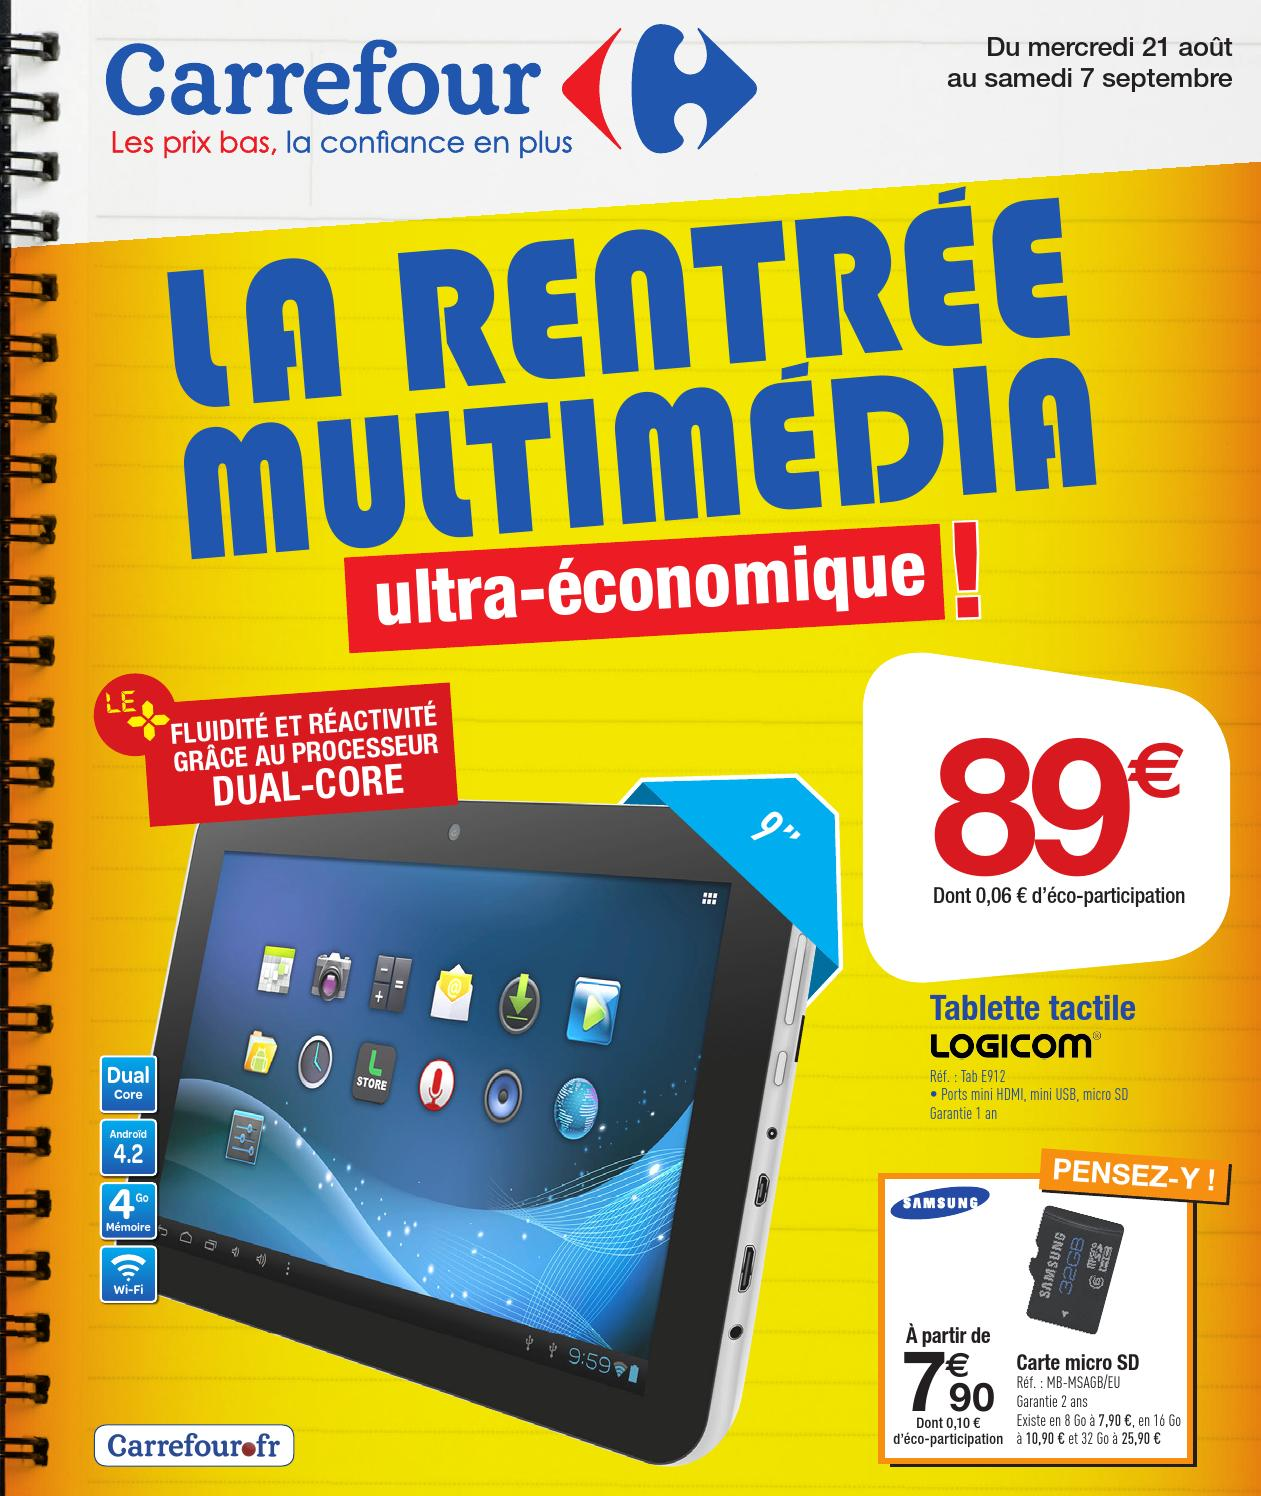 Fr 942 Pdf Uploads Catalog Src By Carrefour Catalogue hCxQdtsr